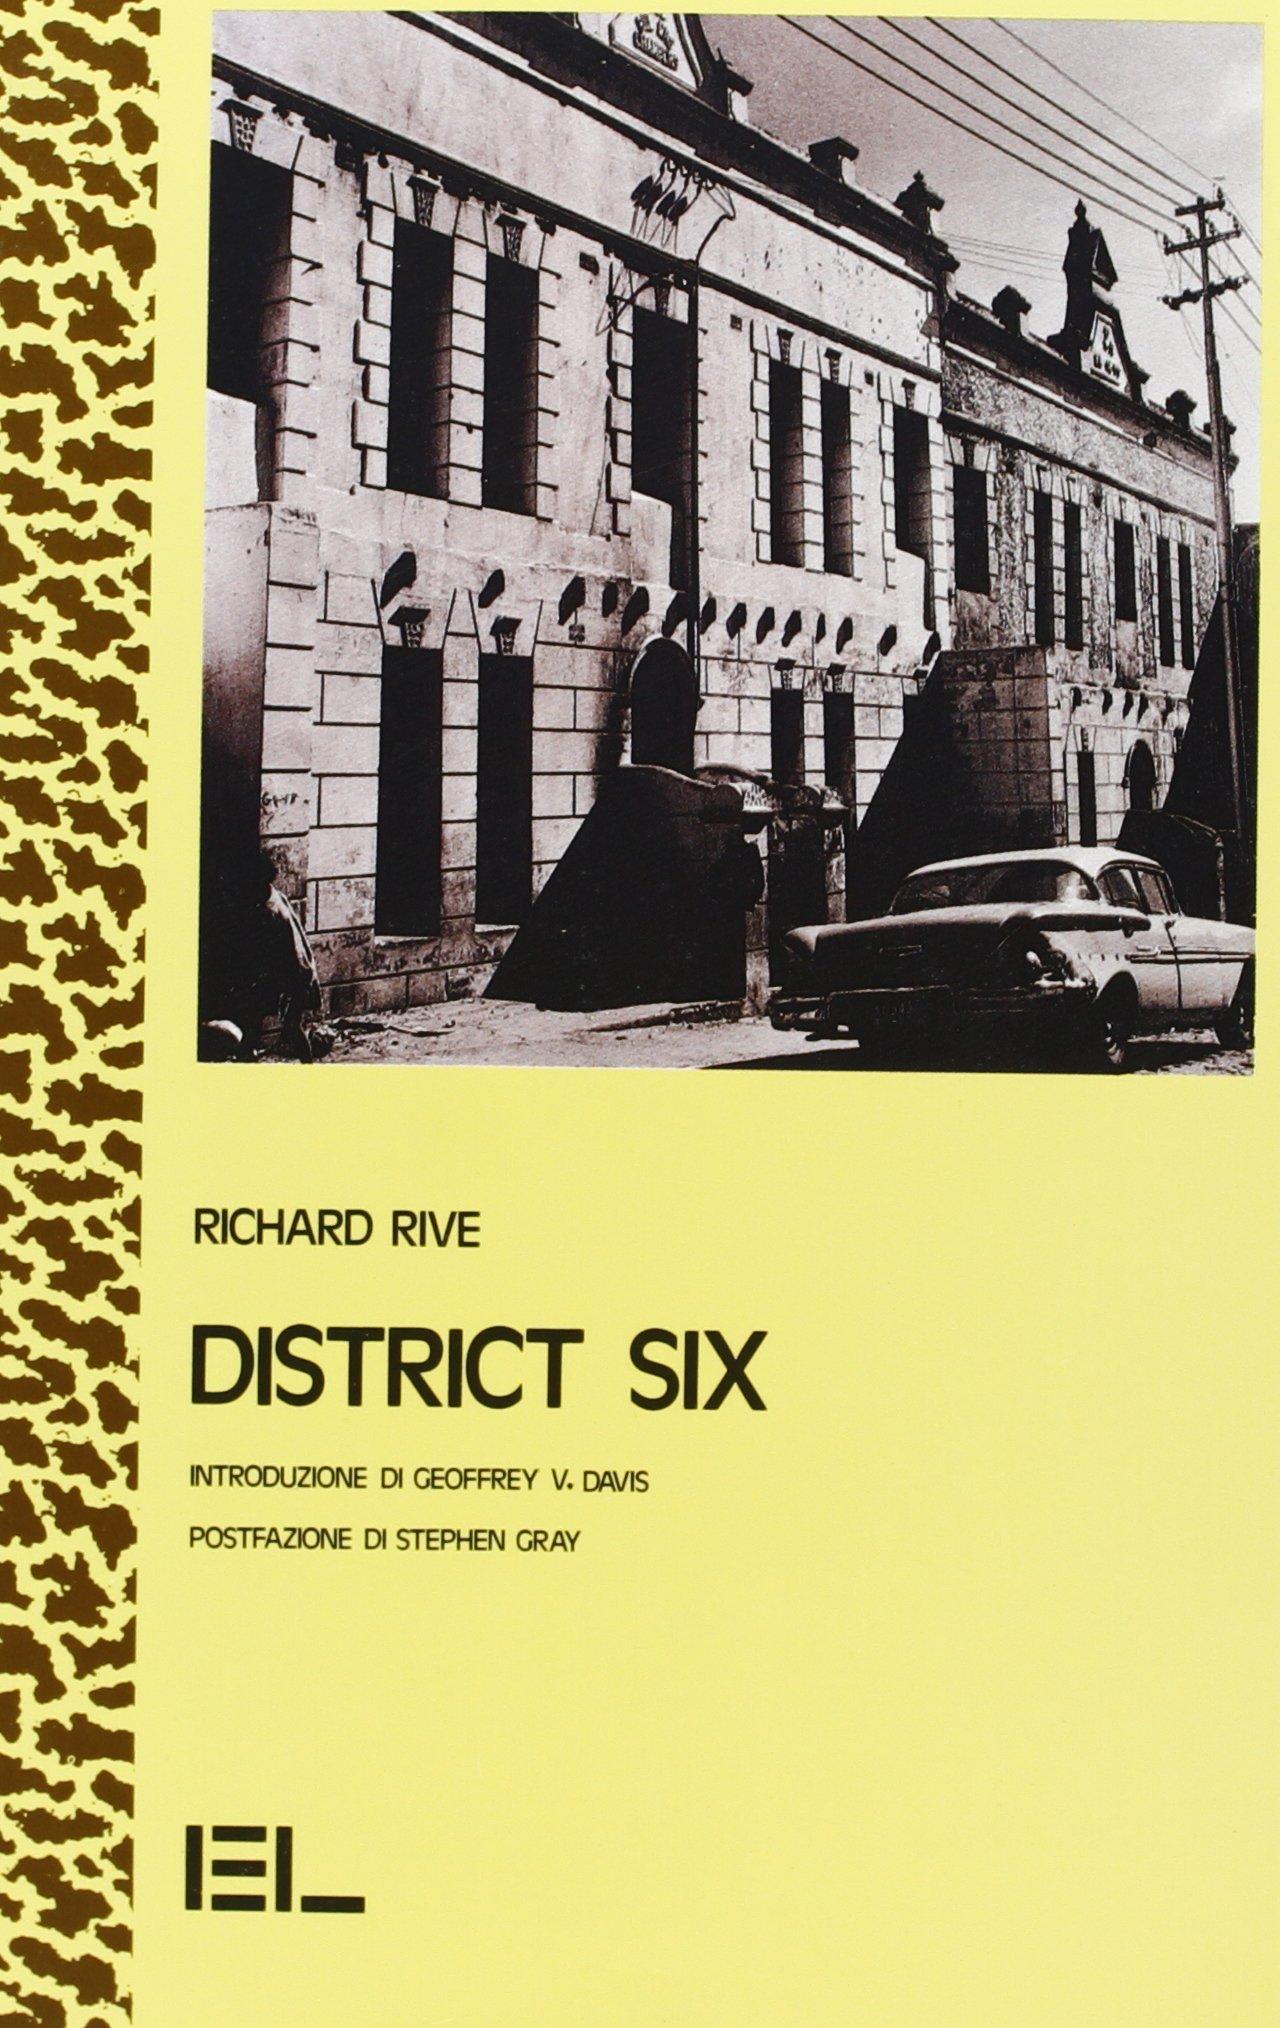 District six